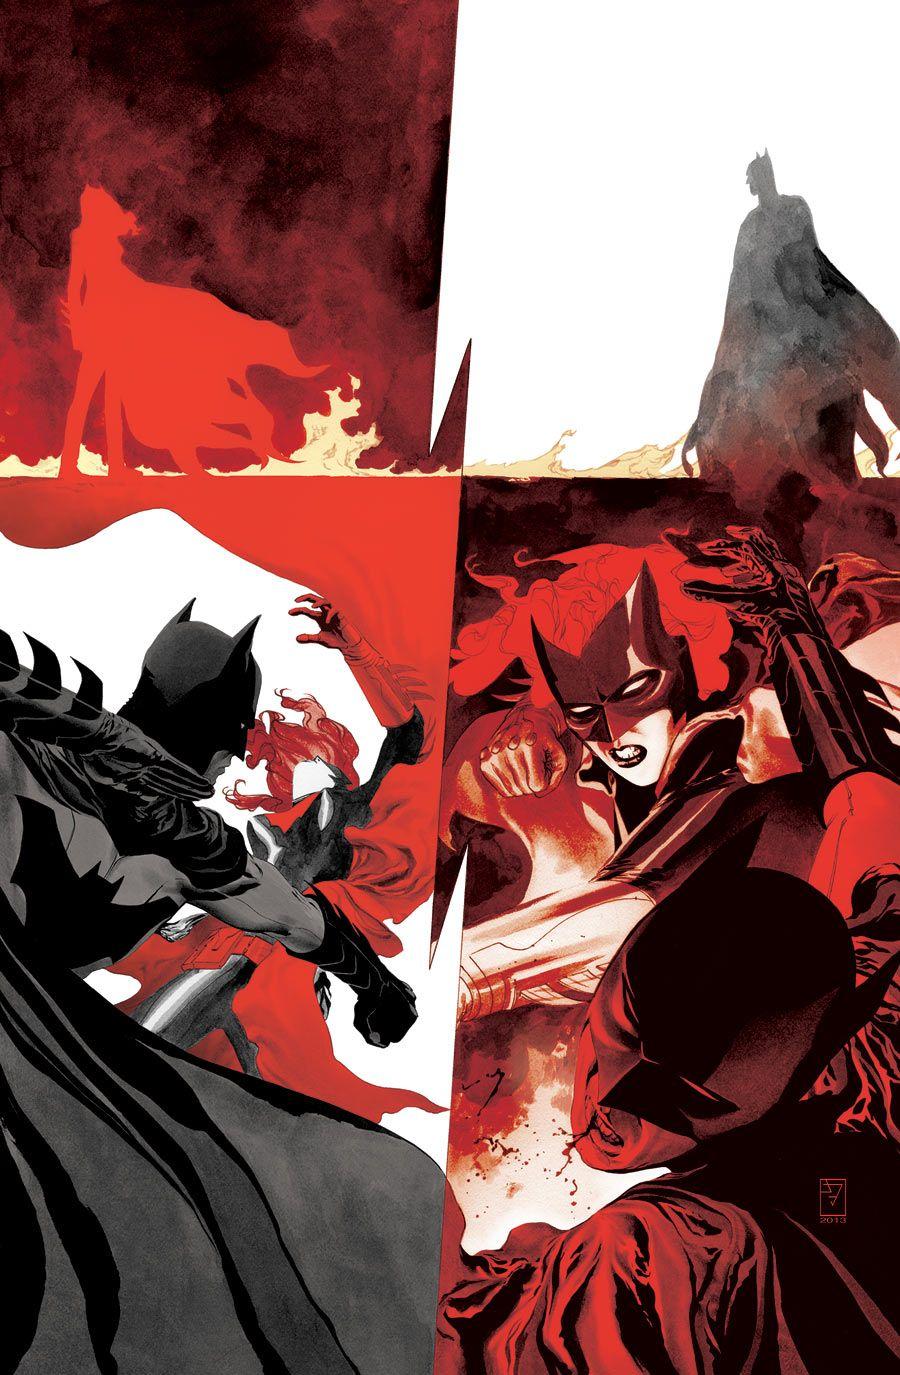 Batwoman #24. Art by J.H. Williams III.